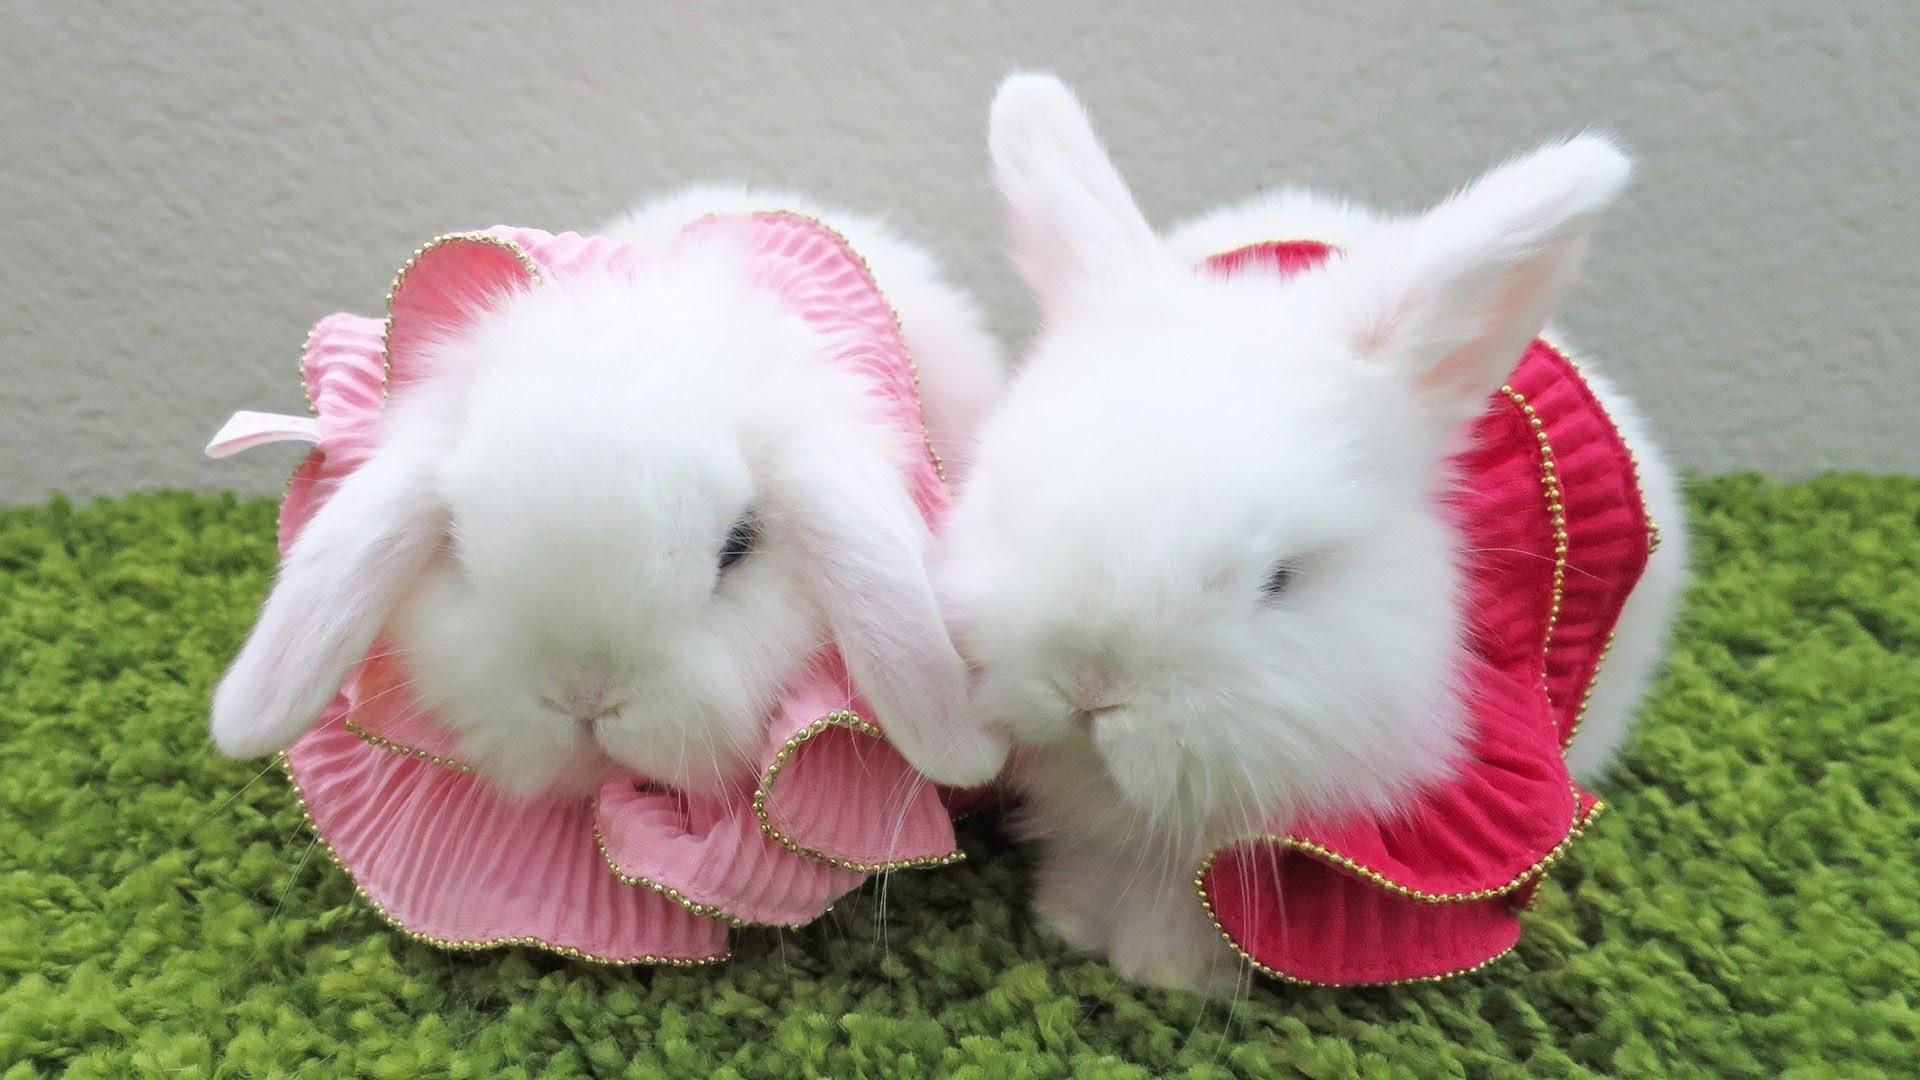 Data Src Baby Bunnies Wallpaper For Andro Rabbit In A Dress 1920x1080 Wallpaper Teahub Io